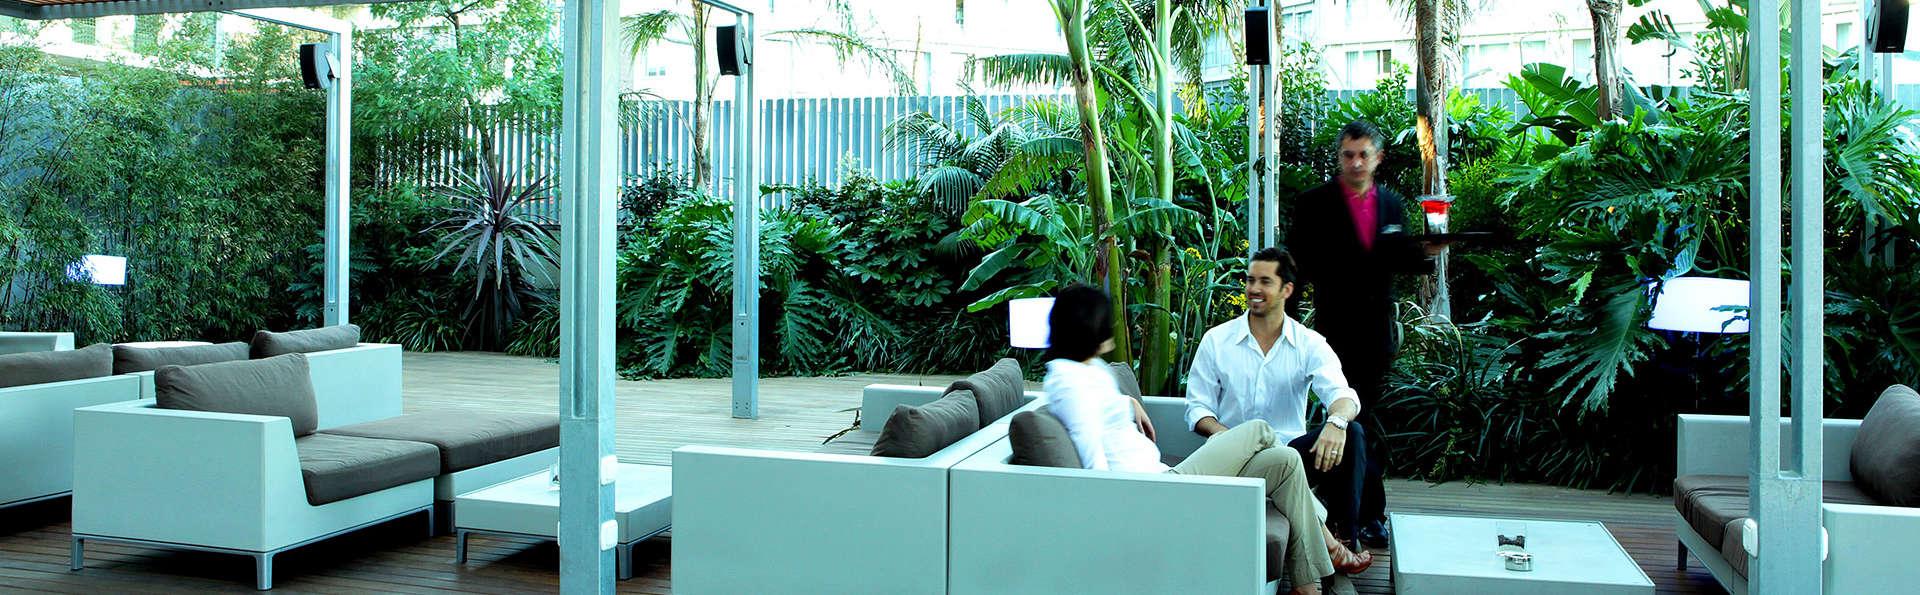 Hotel SB Diagonal Zero - edit_terras1.jpg